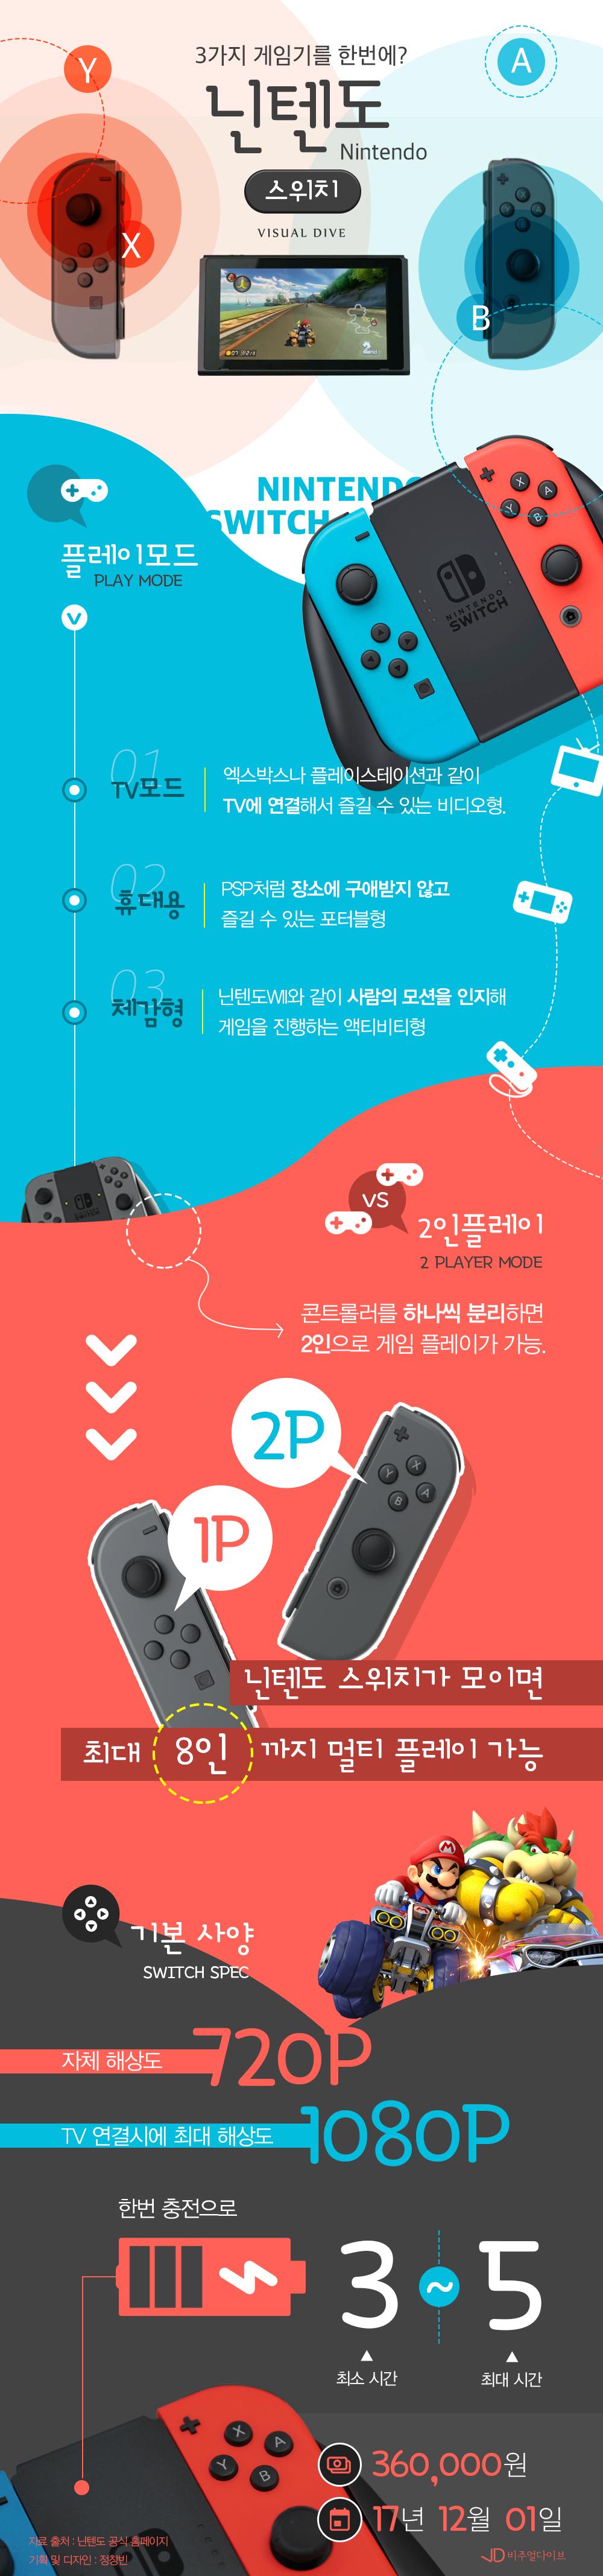 Nintendo_Switch_all